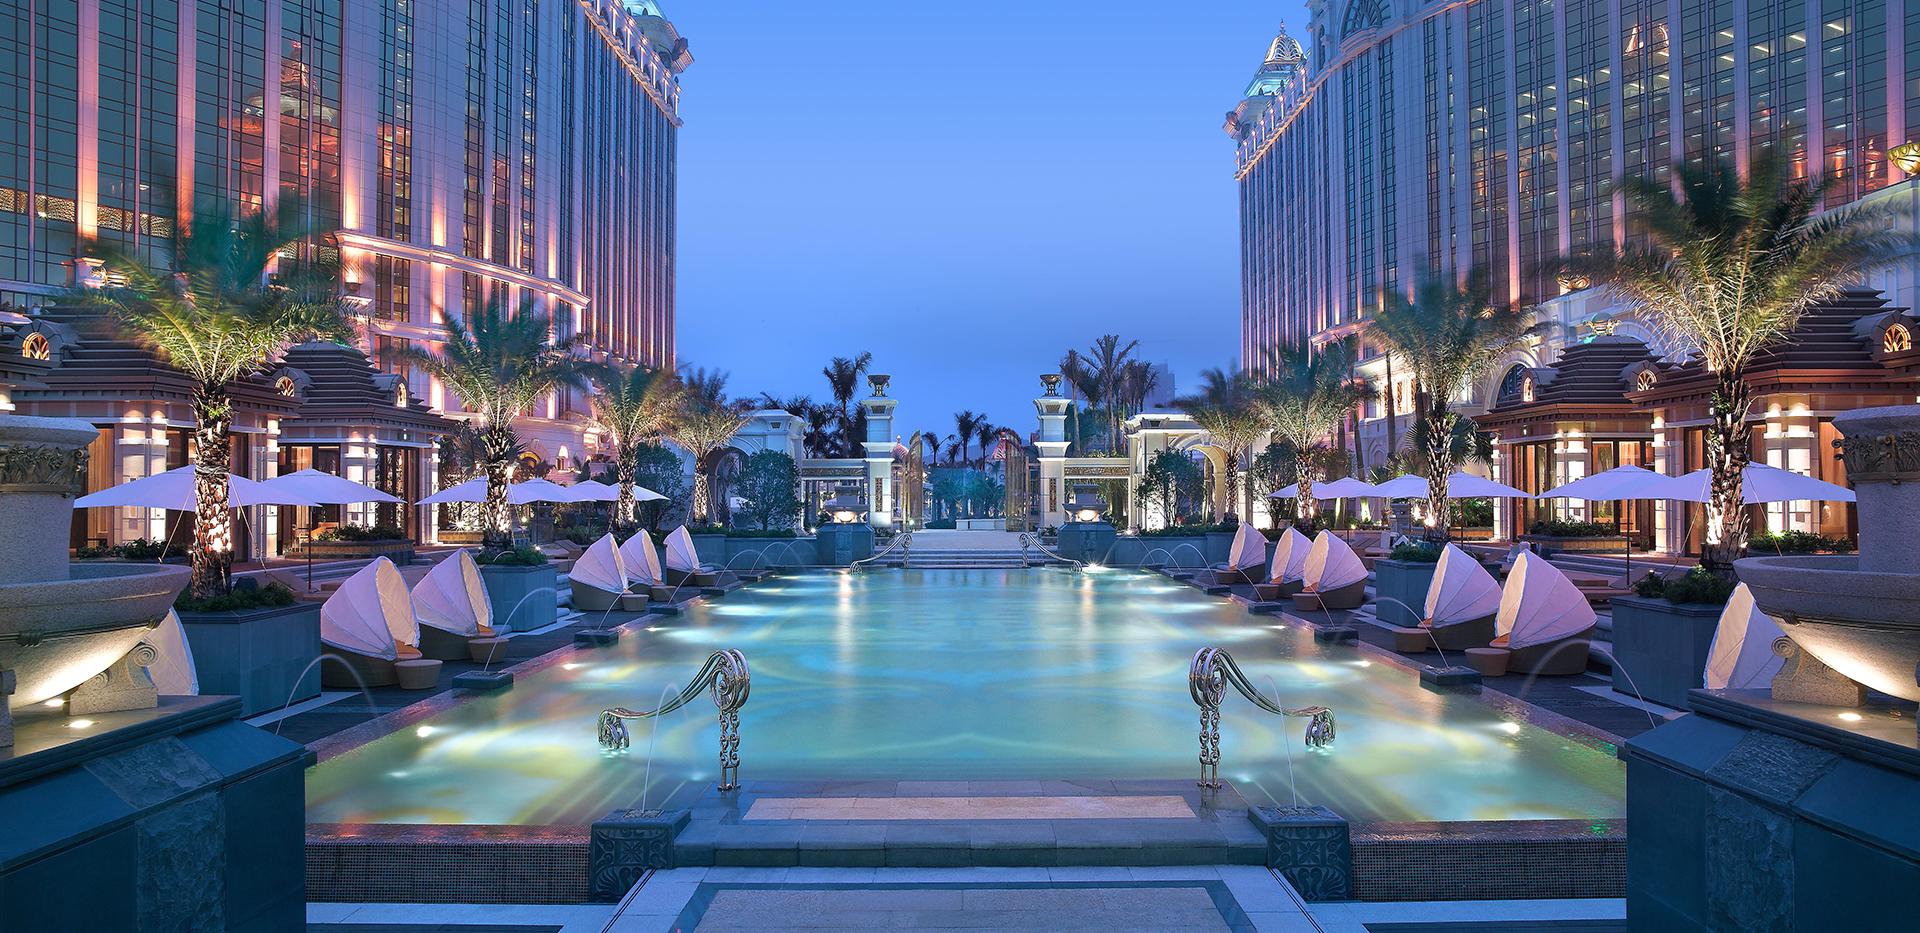 Homepage   Galaxy Macau, the World-Class Asian Resort Destination